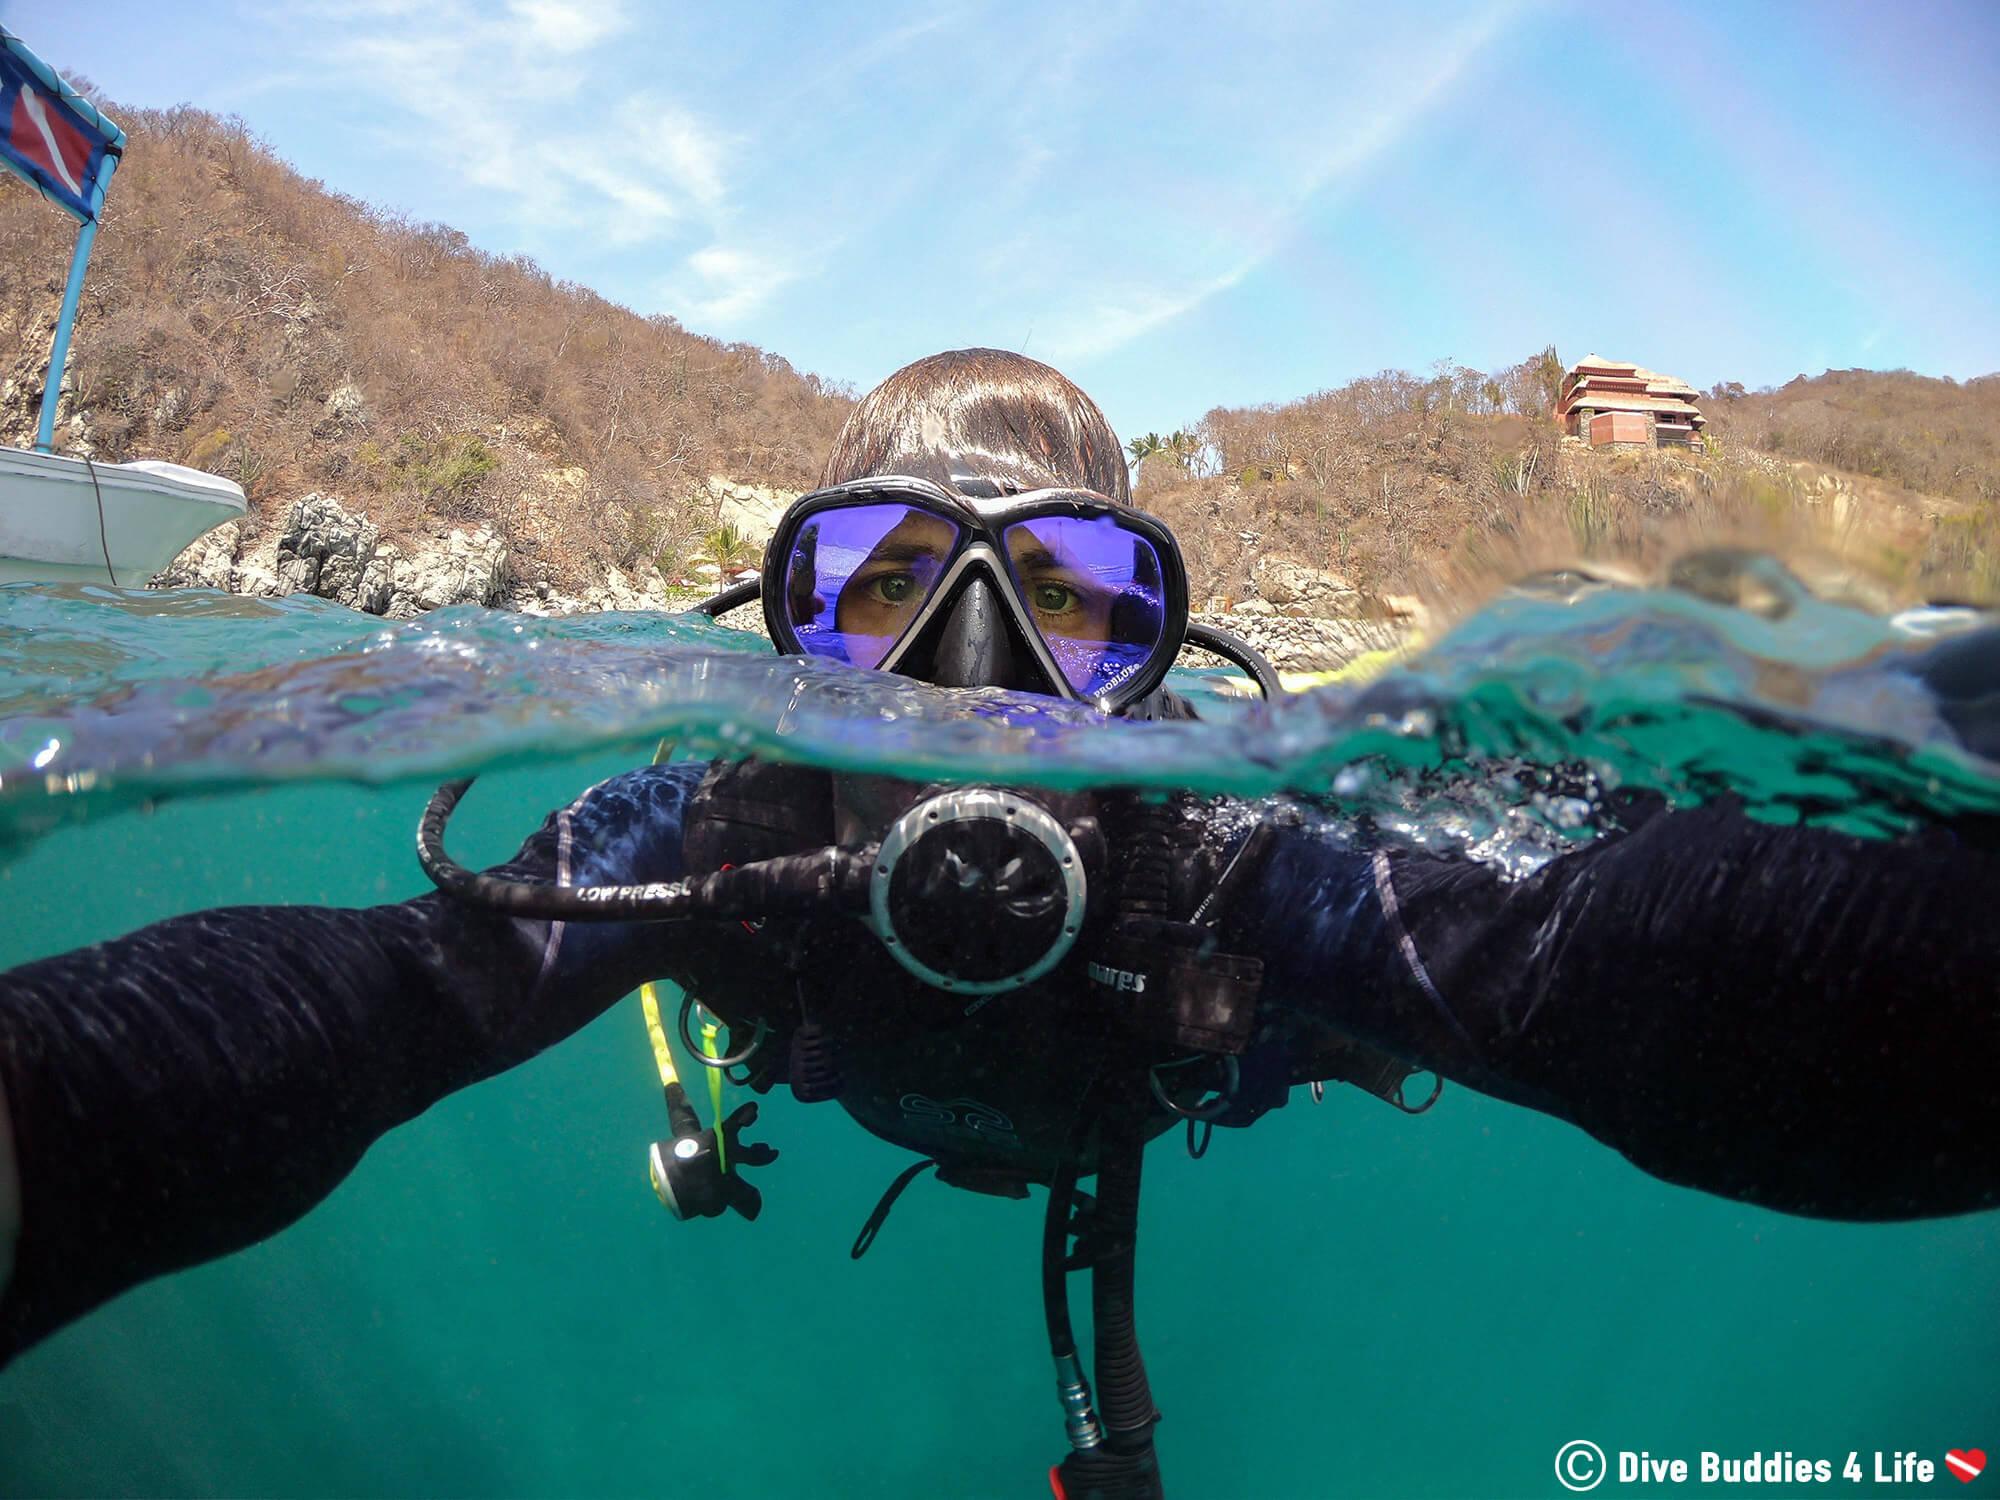 Joey Scuba Diving In Zihuatanjero, Split Surface Shot, Mexico